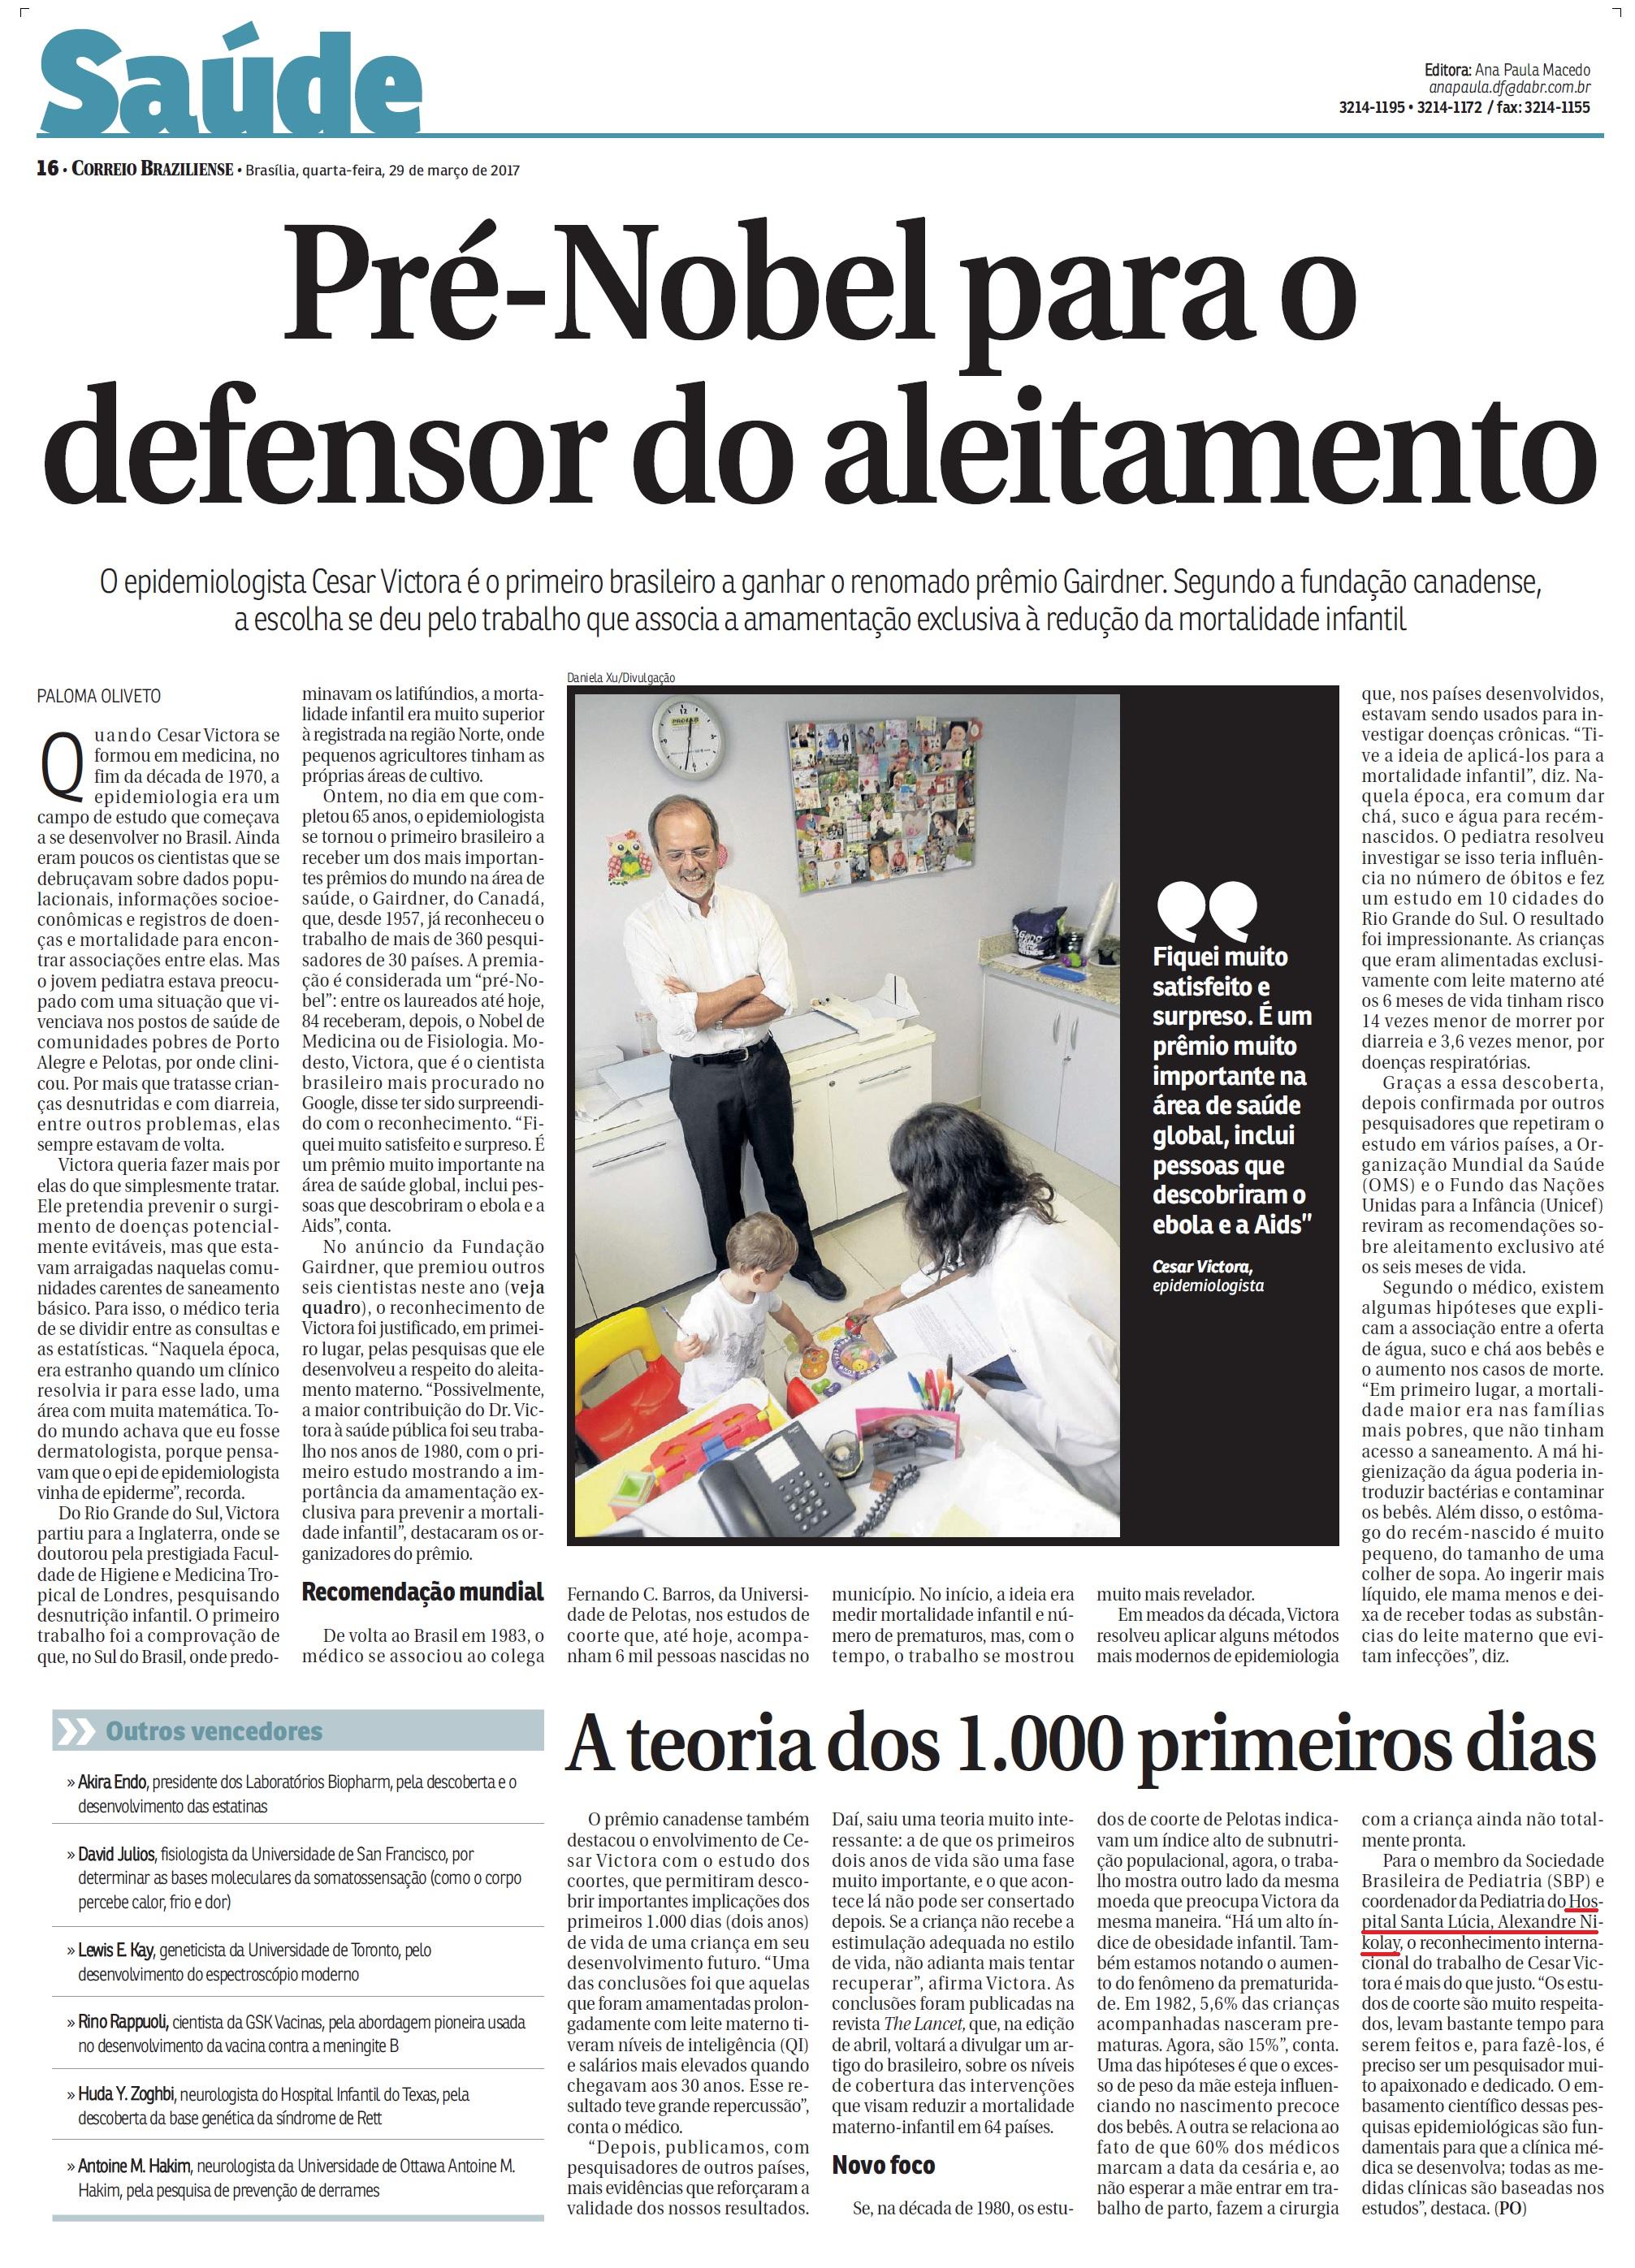 Correio Braziliense - Dr. Alexandre Nikolay HSL - 29-03-2017